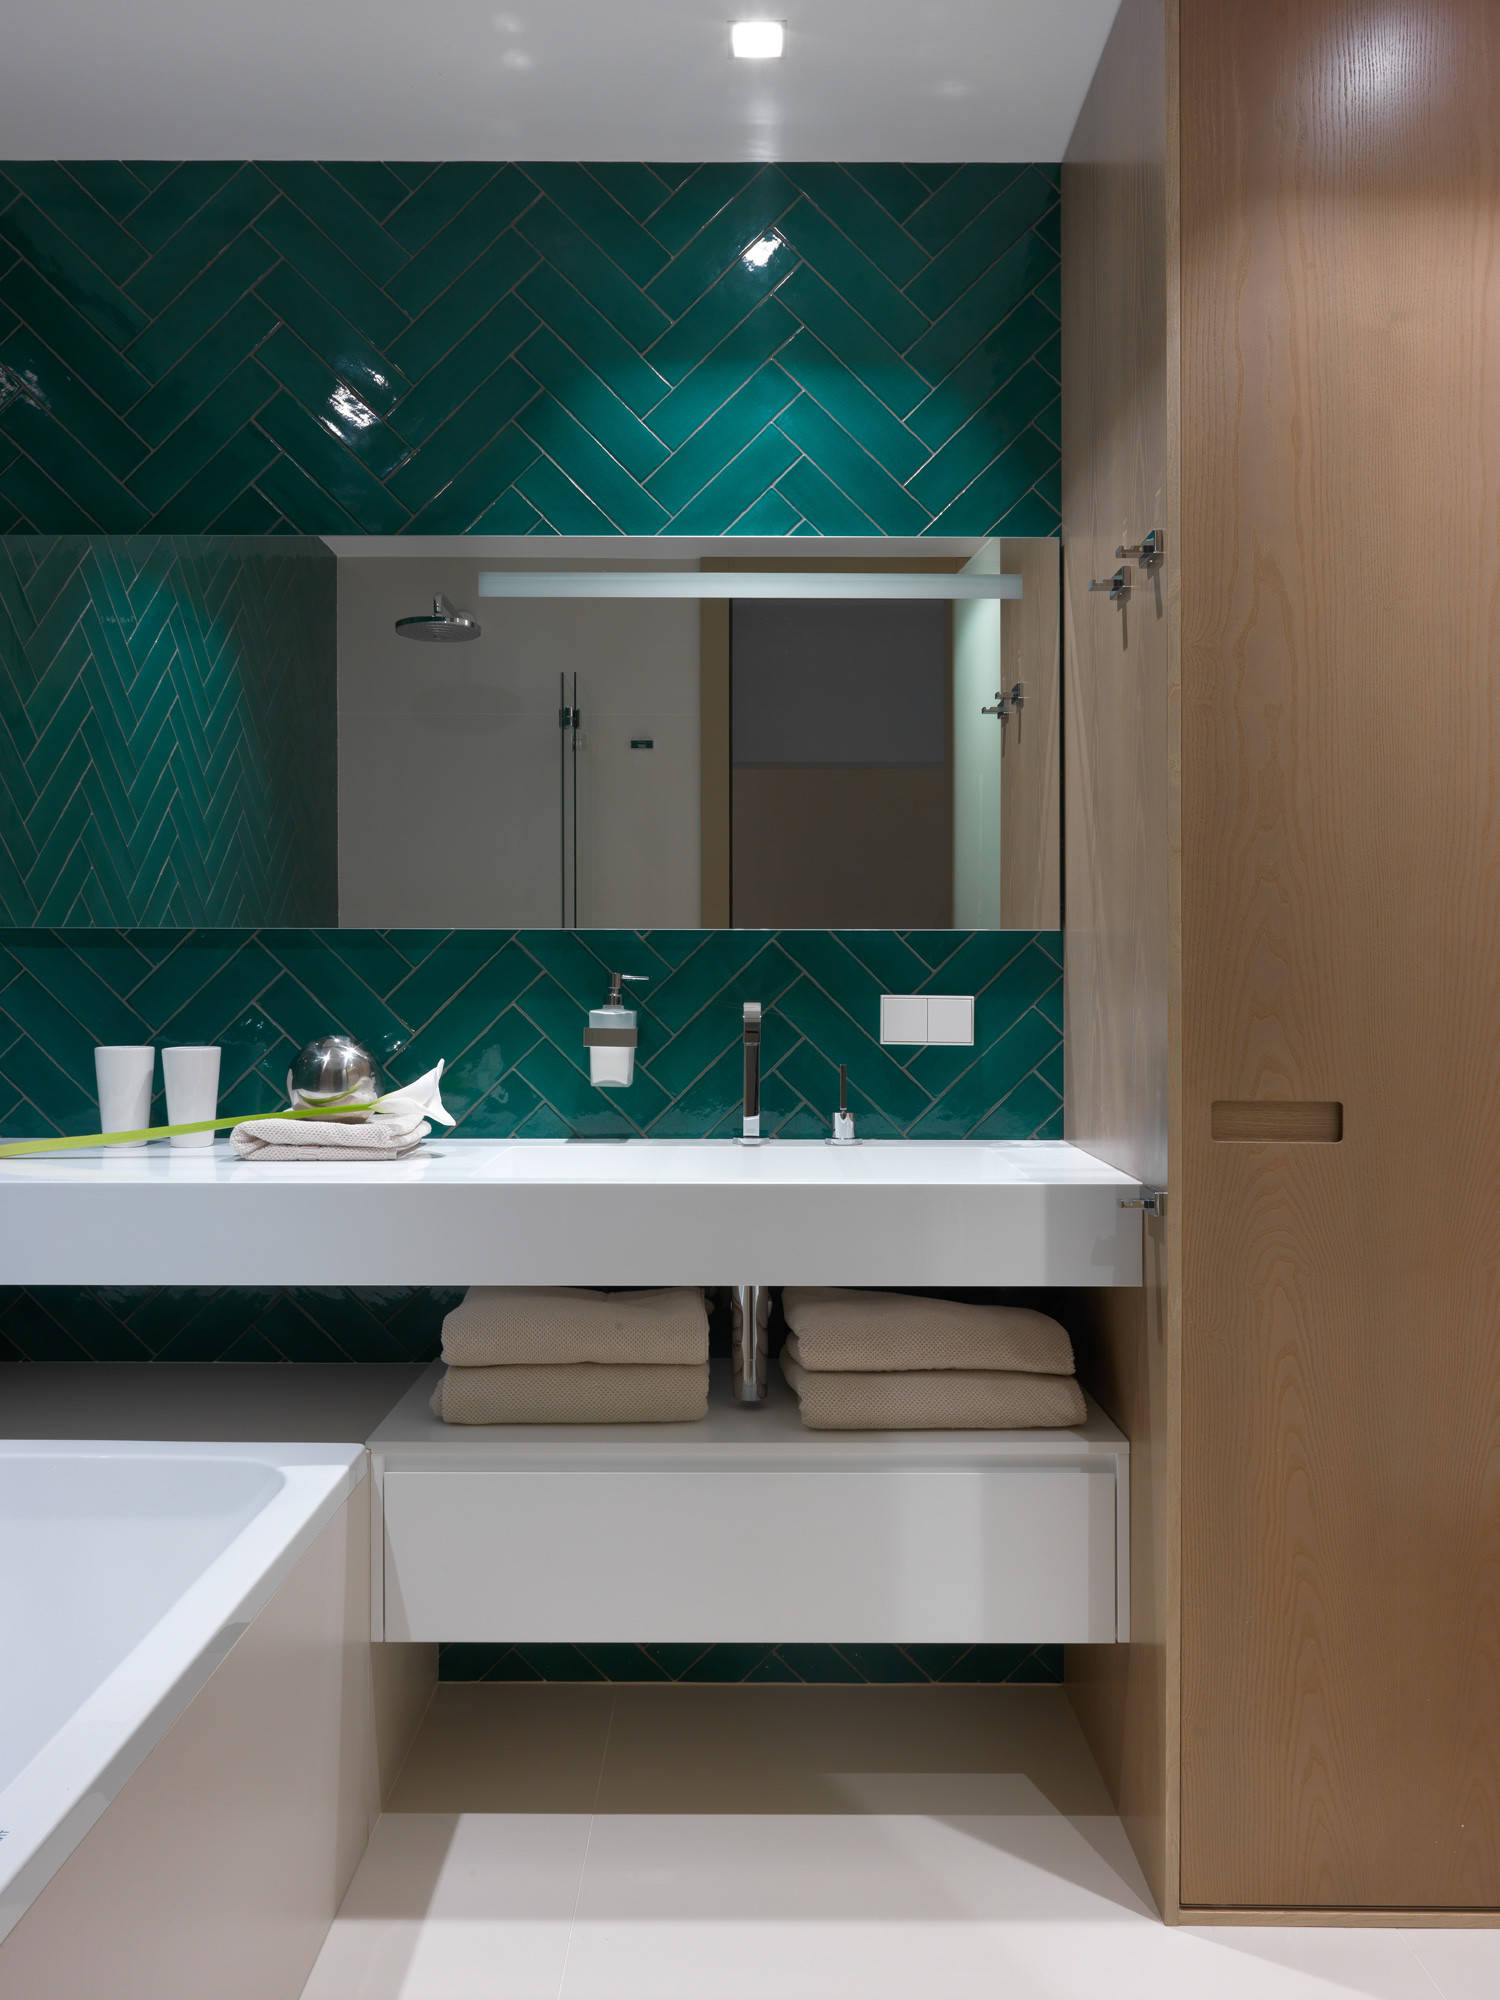 Темно-зеленая плитка на стенах ванной и белый пол